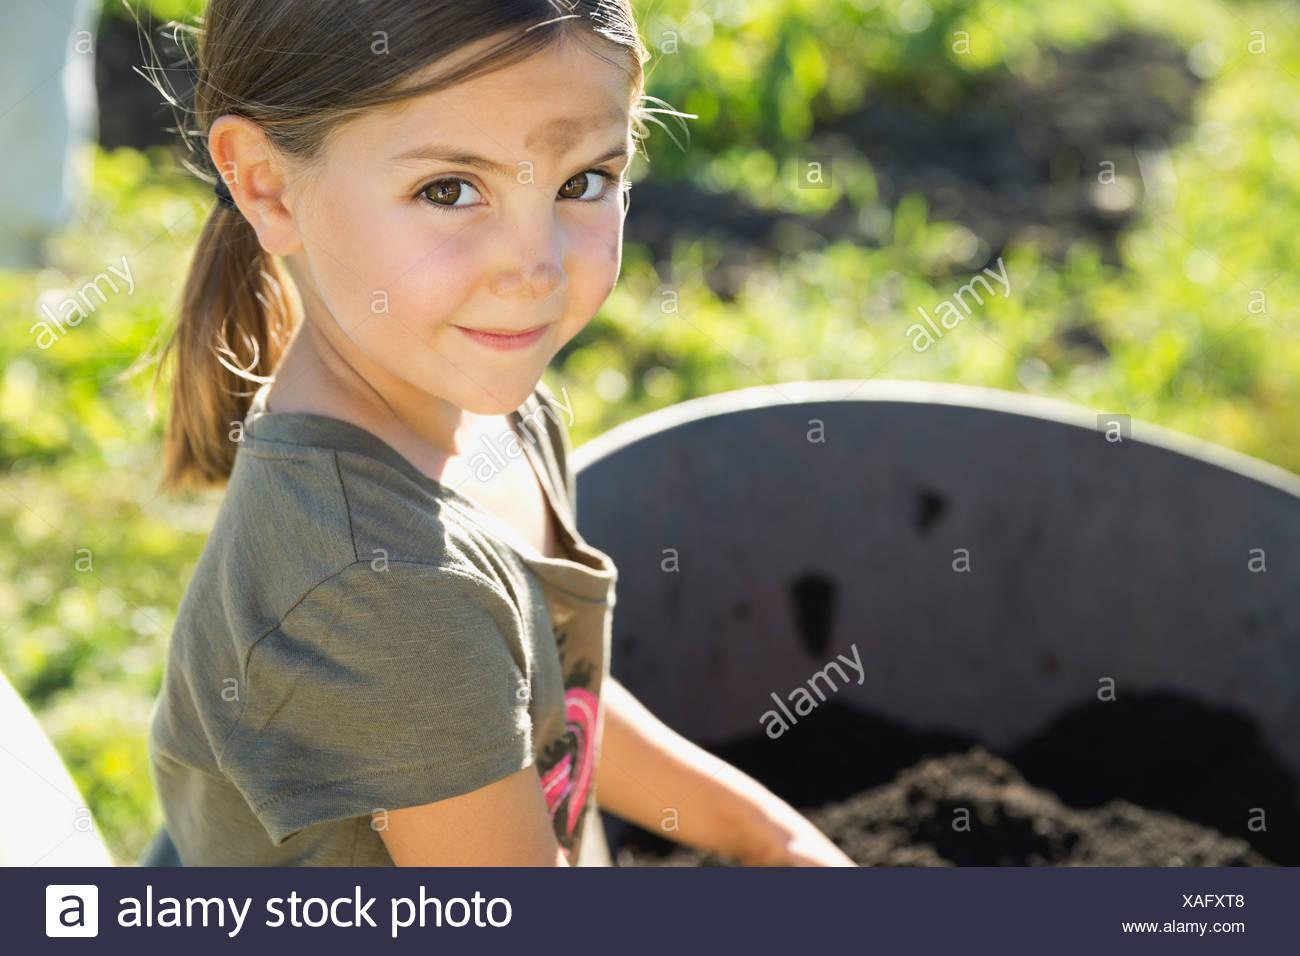 Portrait of cute girl standing next to wheelbarrow Stock Photo